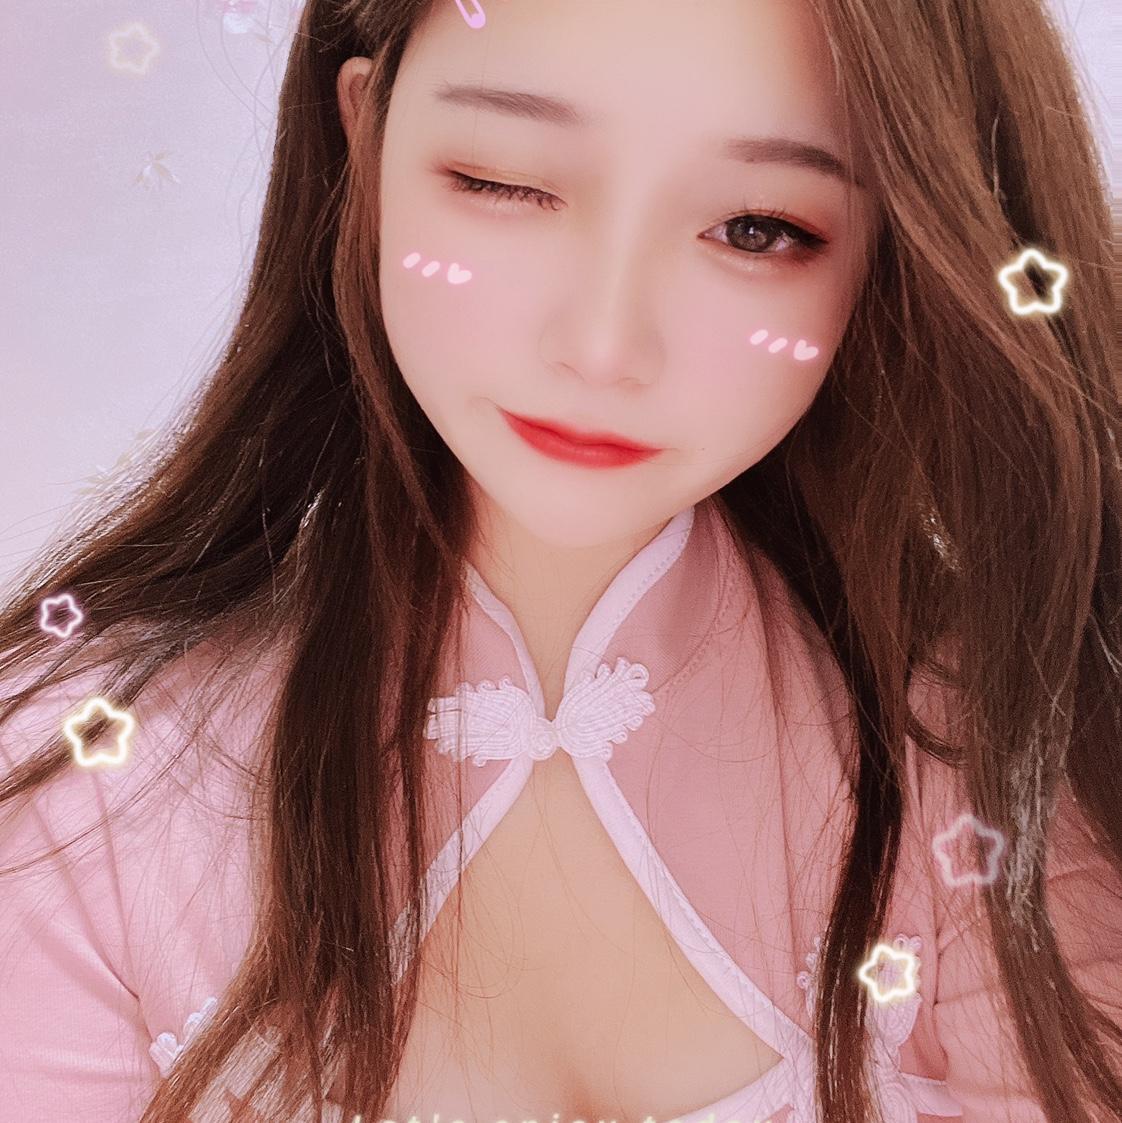 〖M〗谜兔♡感谢我走走帮兔兔升级~